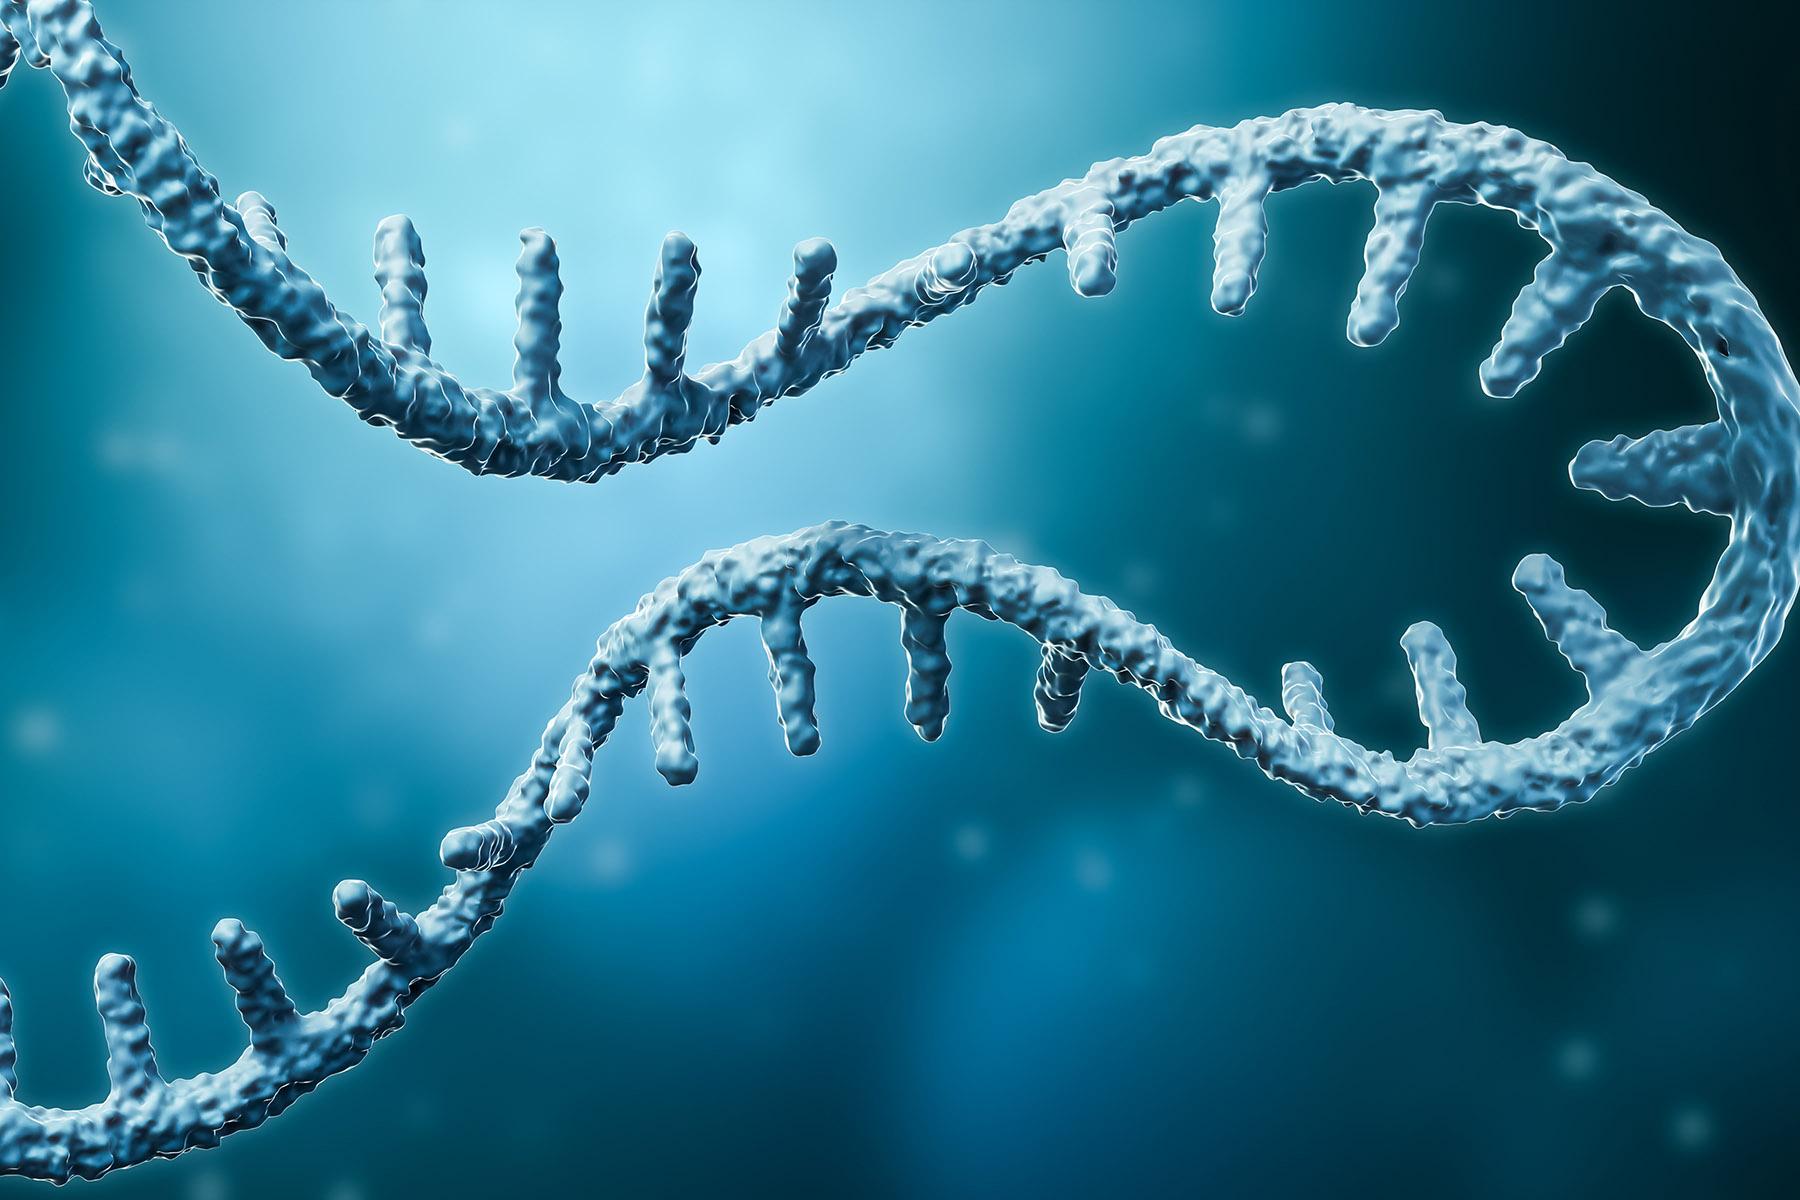 Understanding alternative splicing in health and disease.